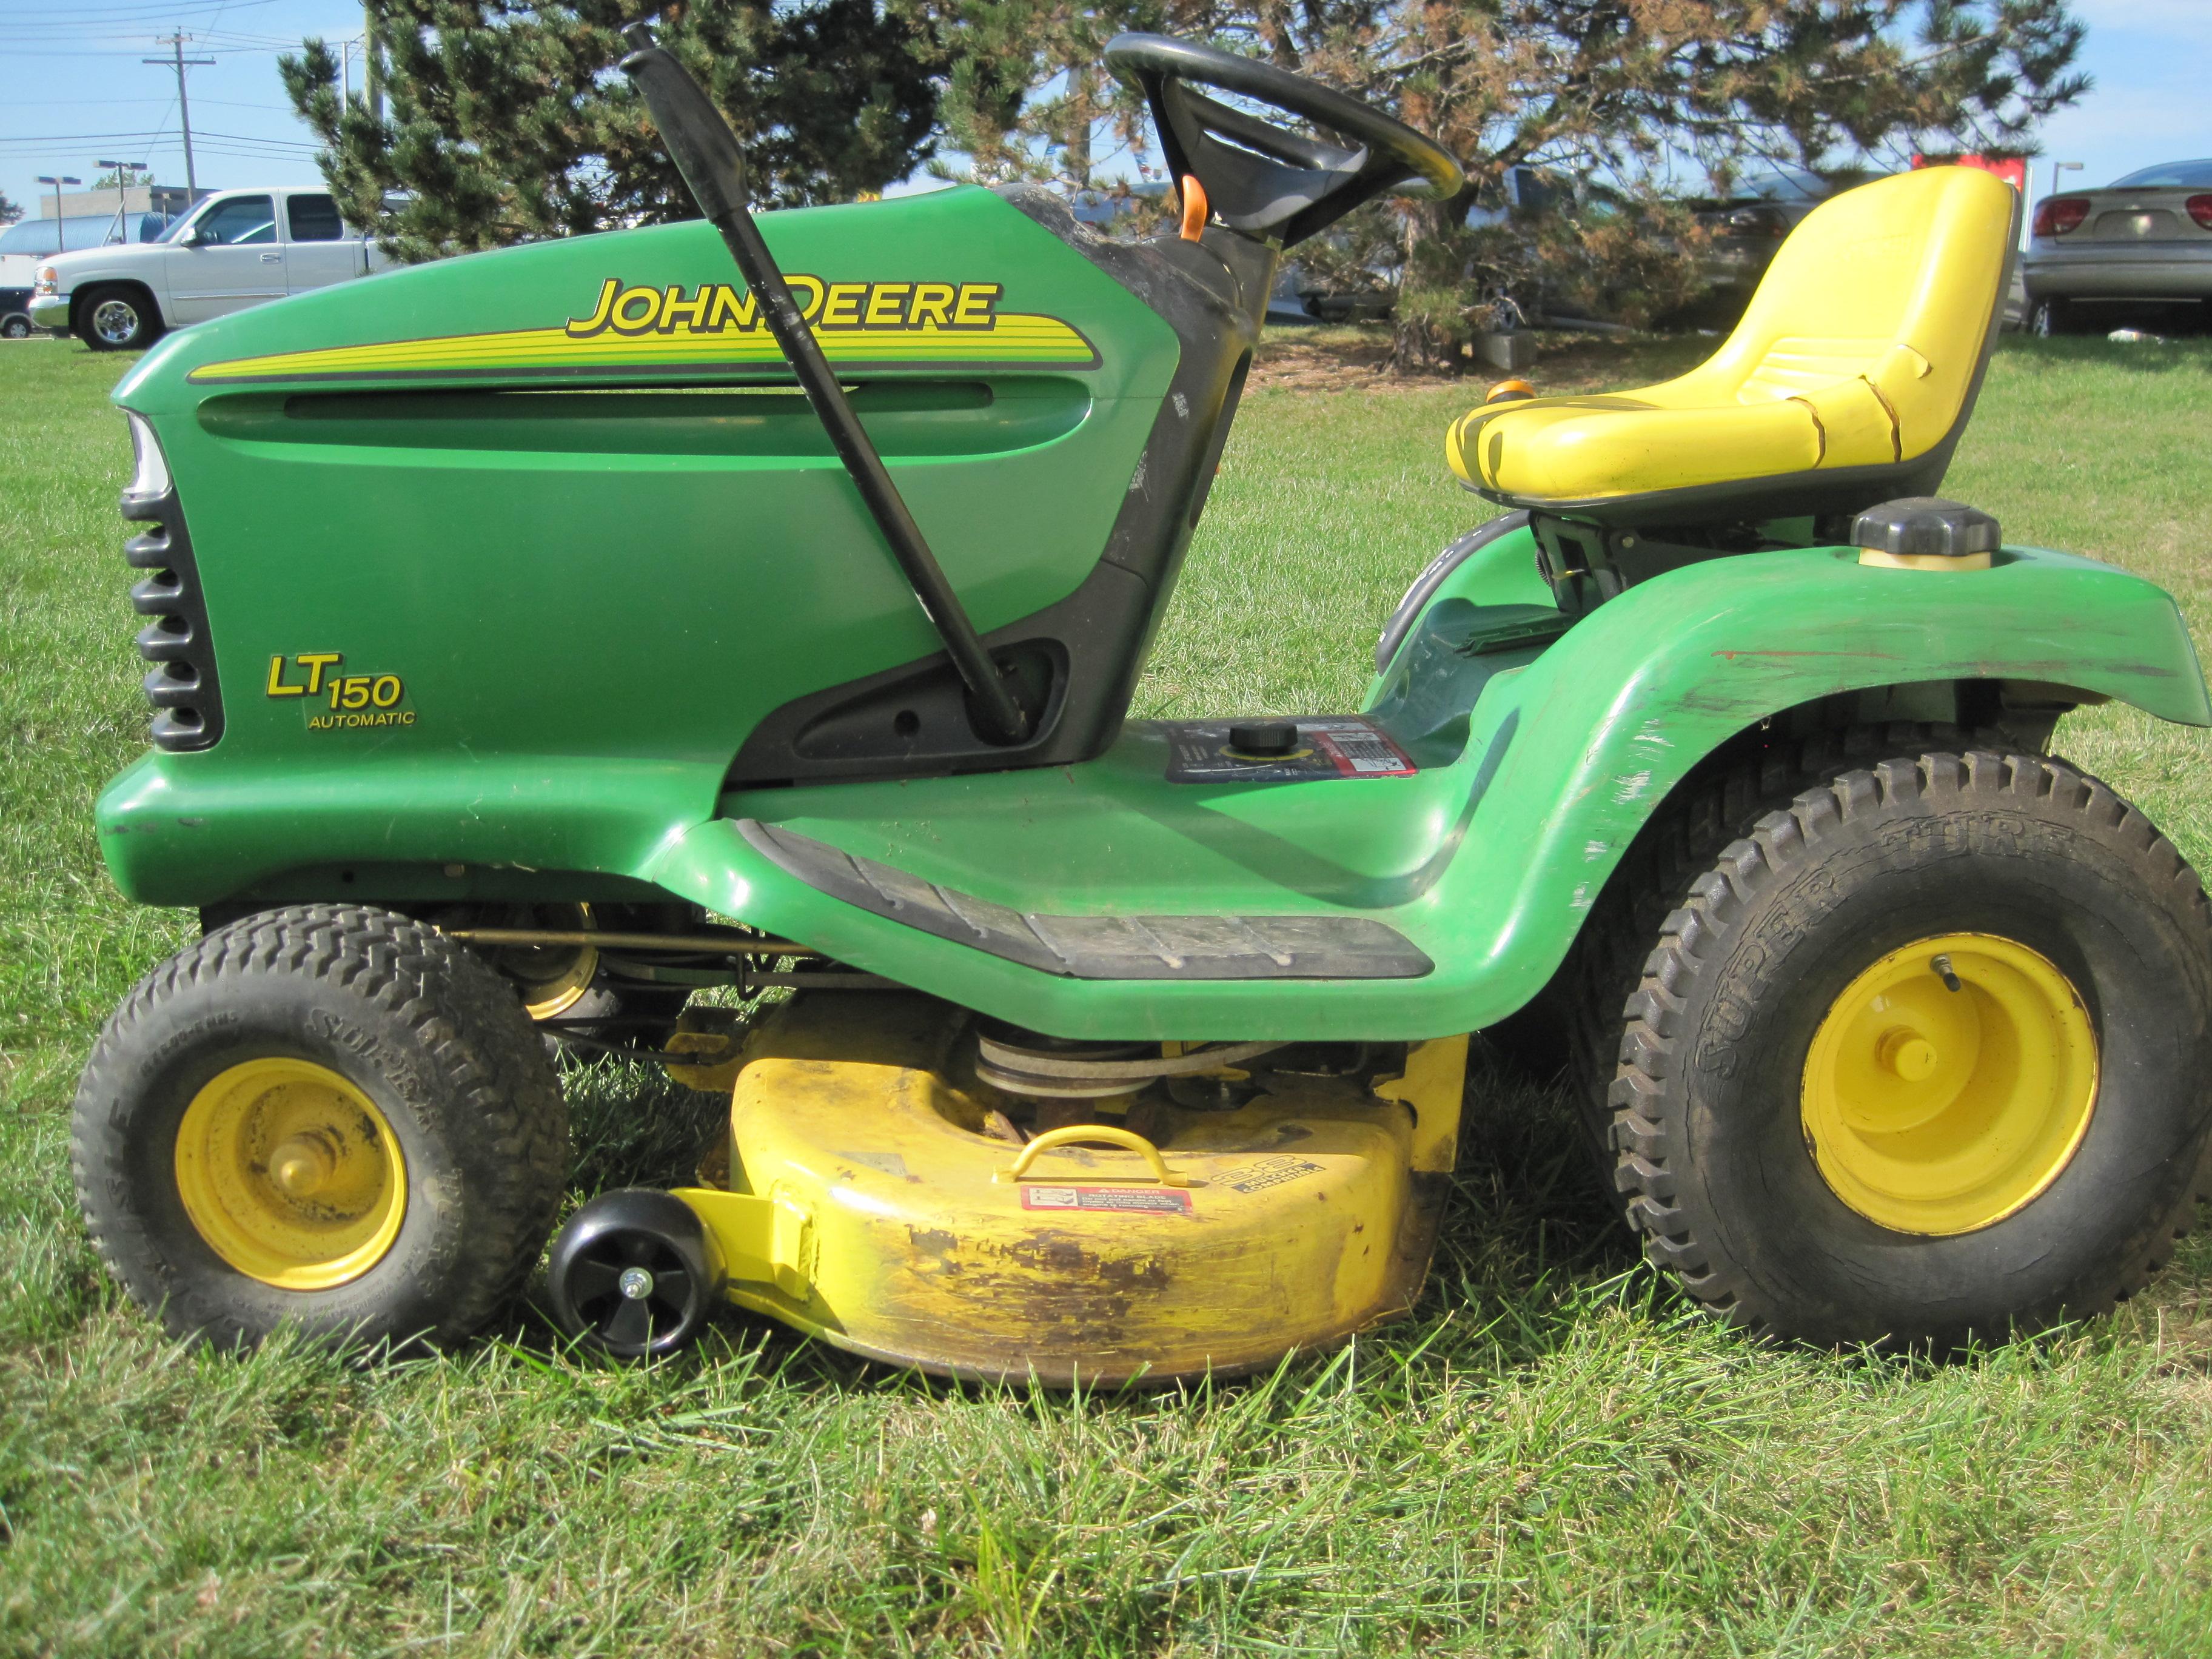 John Deere Lawn Mower Blades : Lawn mower blades for husqvarna awd partsgeek promo